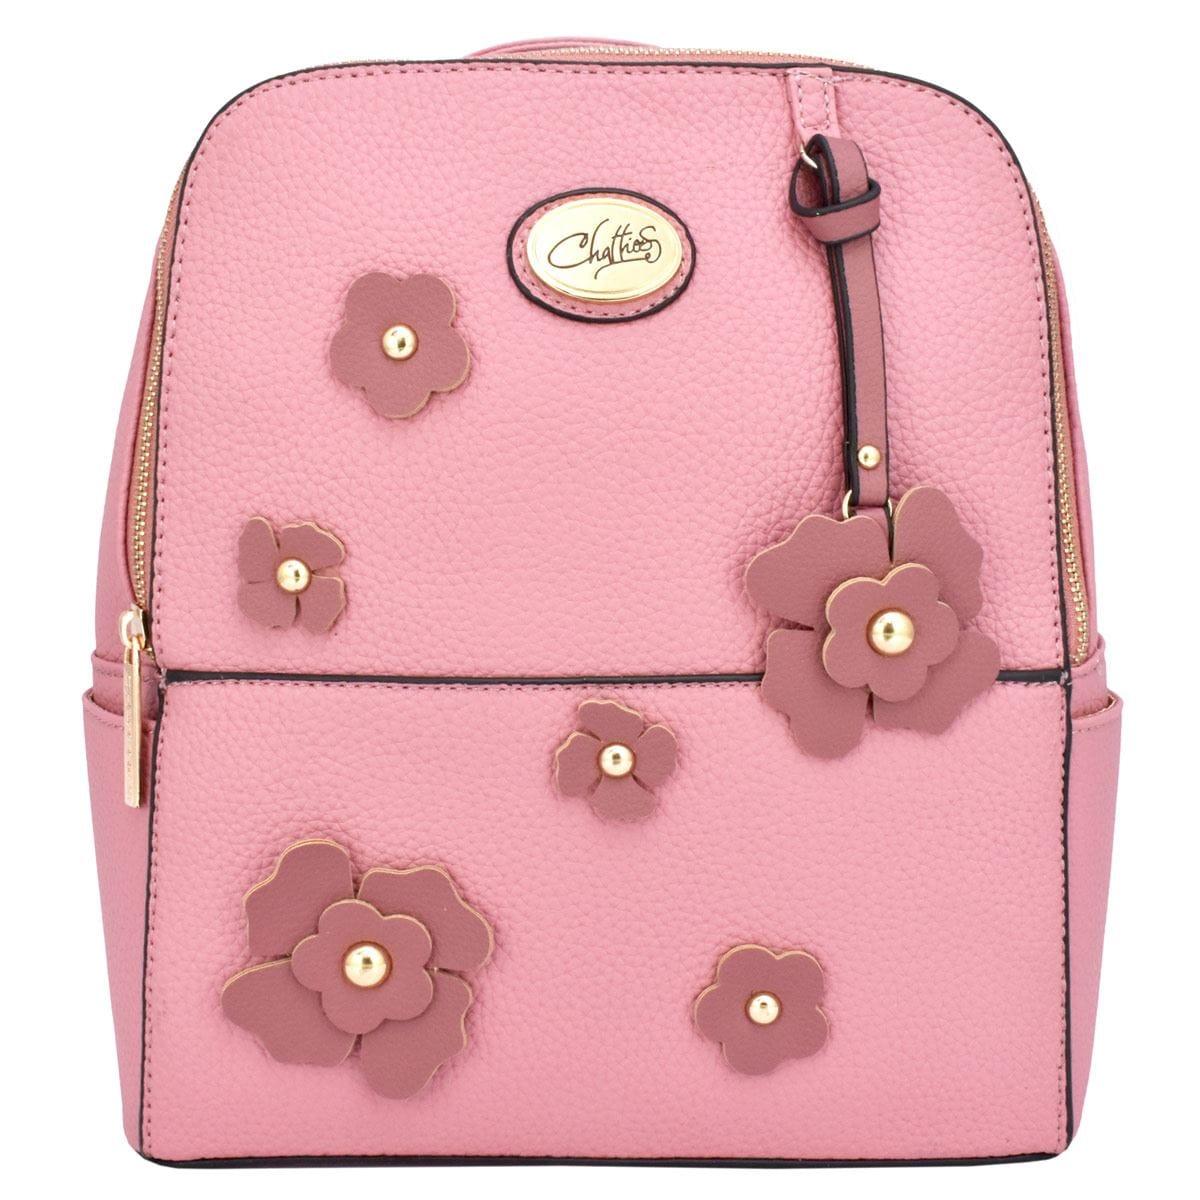 Backpack Chatties rosa